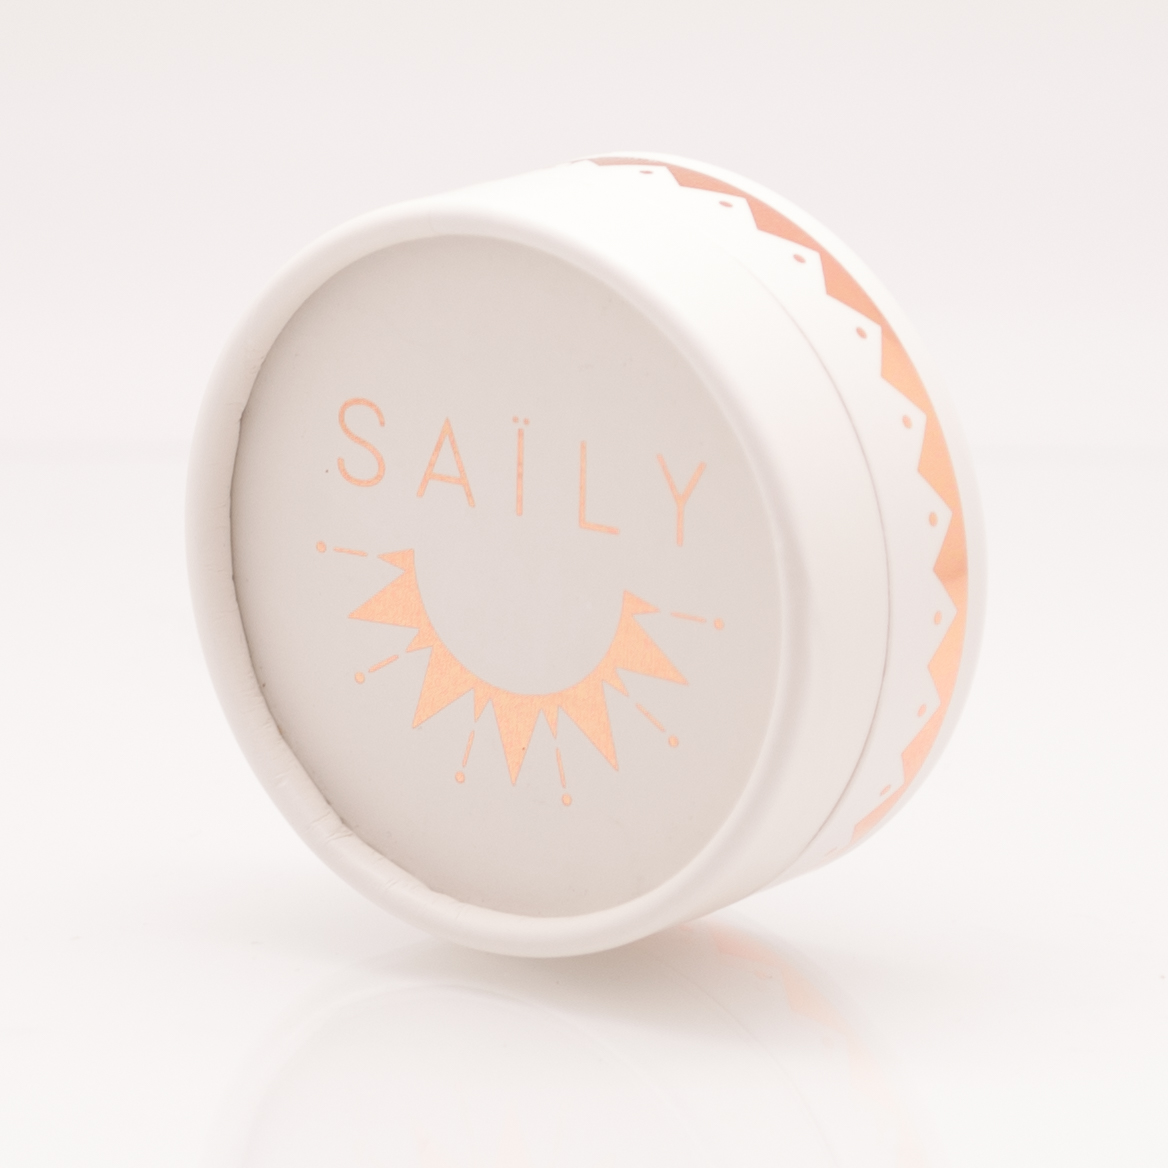 SAILY BOLA シードオブライフマタニティネックレス -シルバー/ホワイト